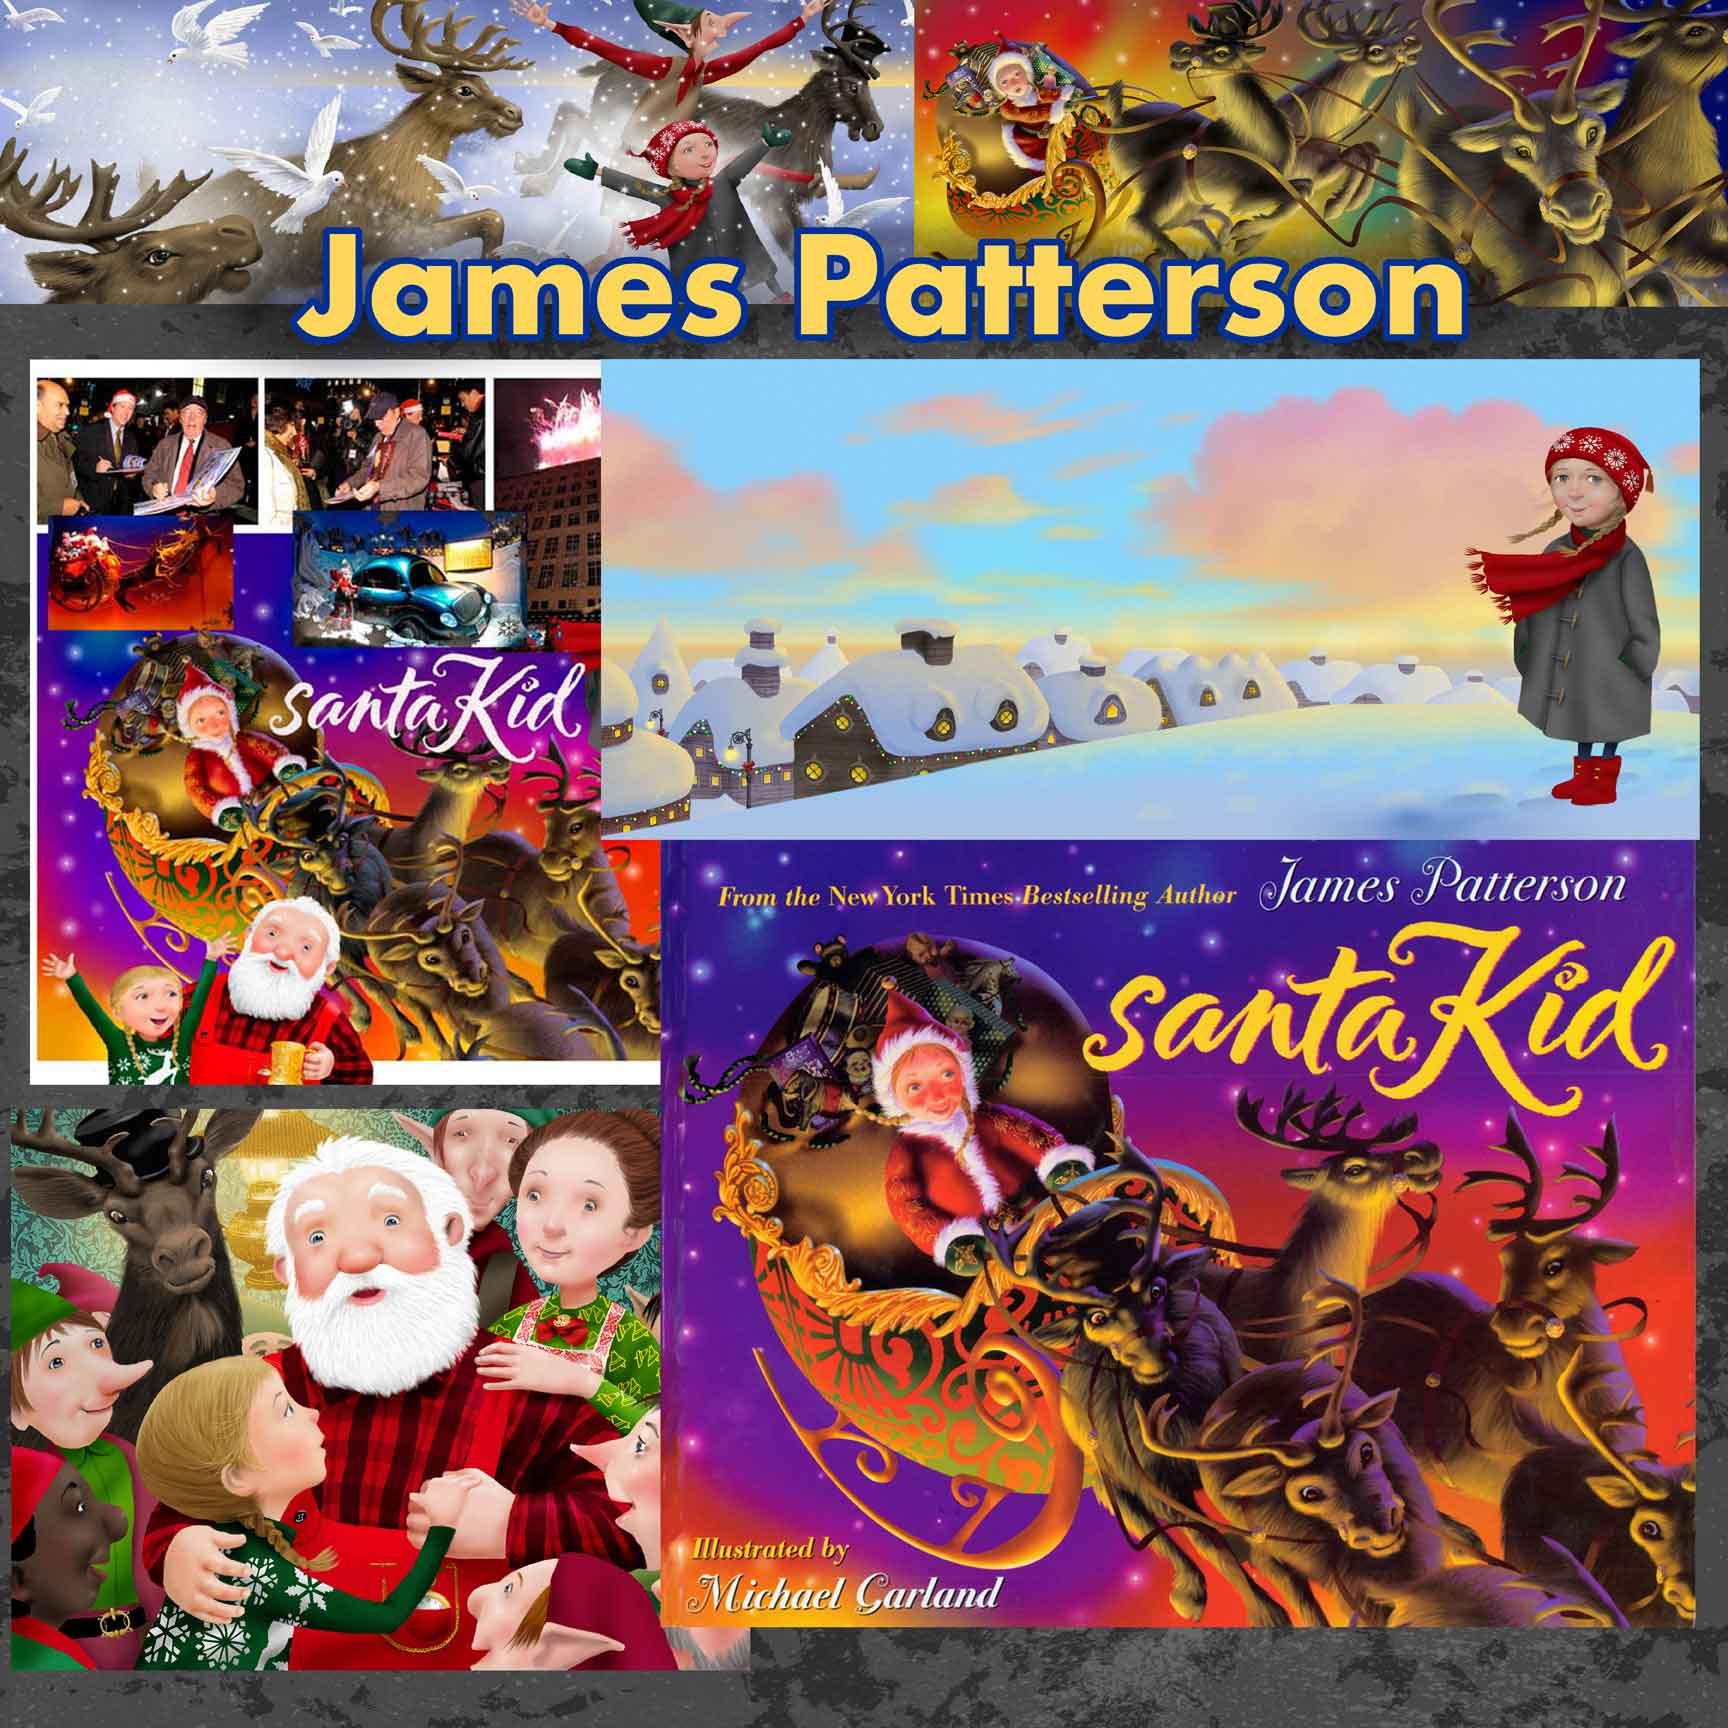 JamesPatterson-optimized